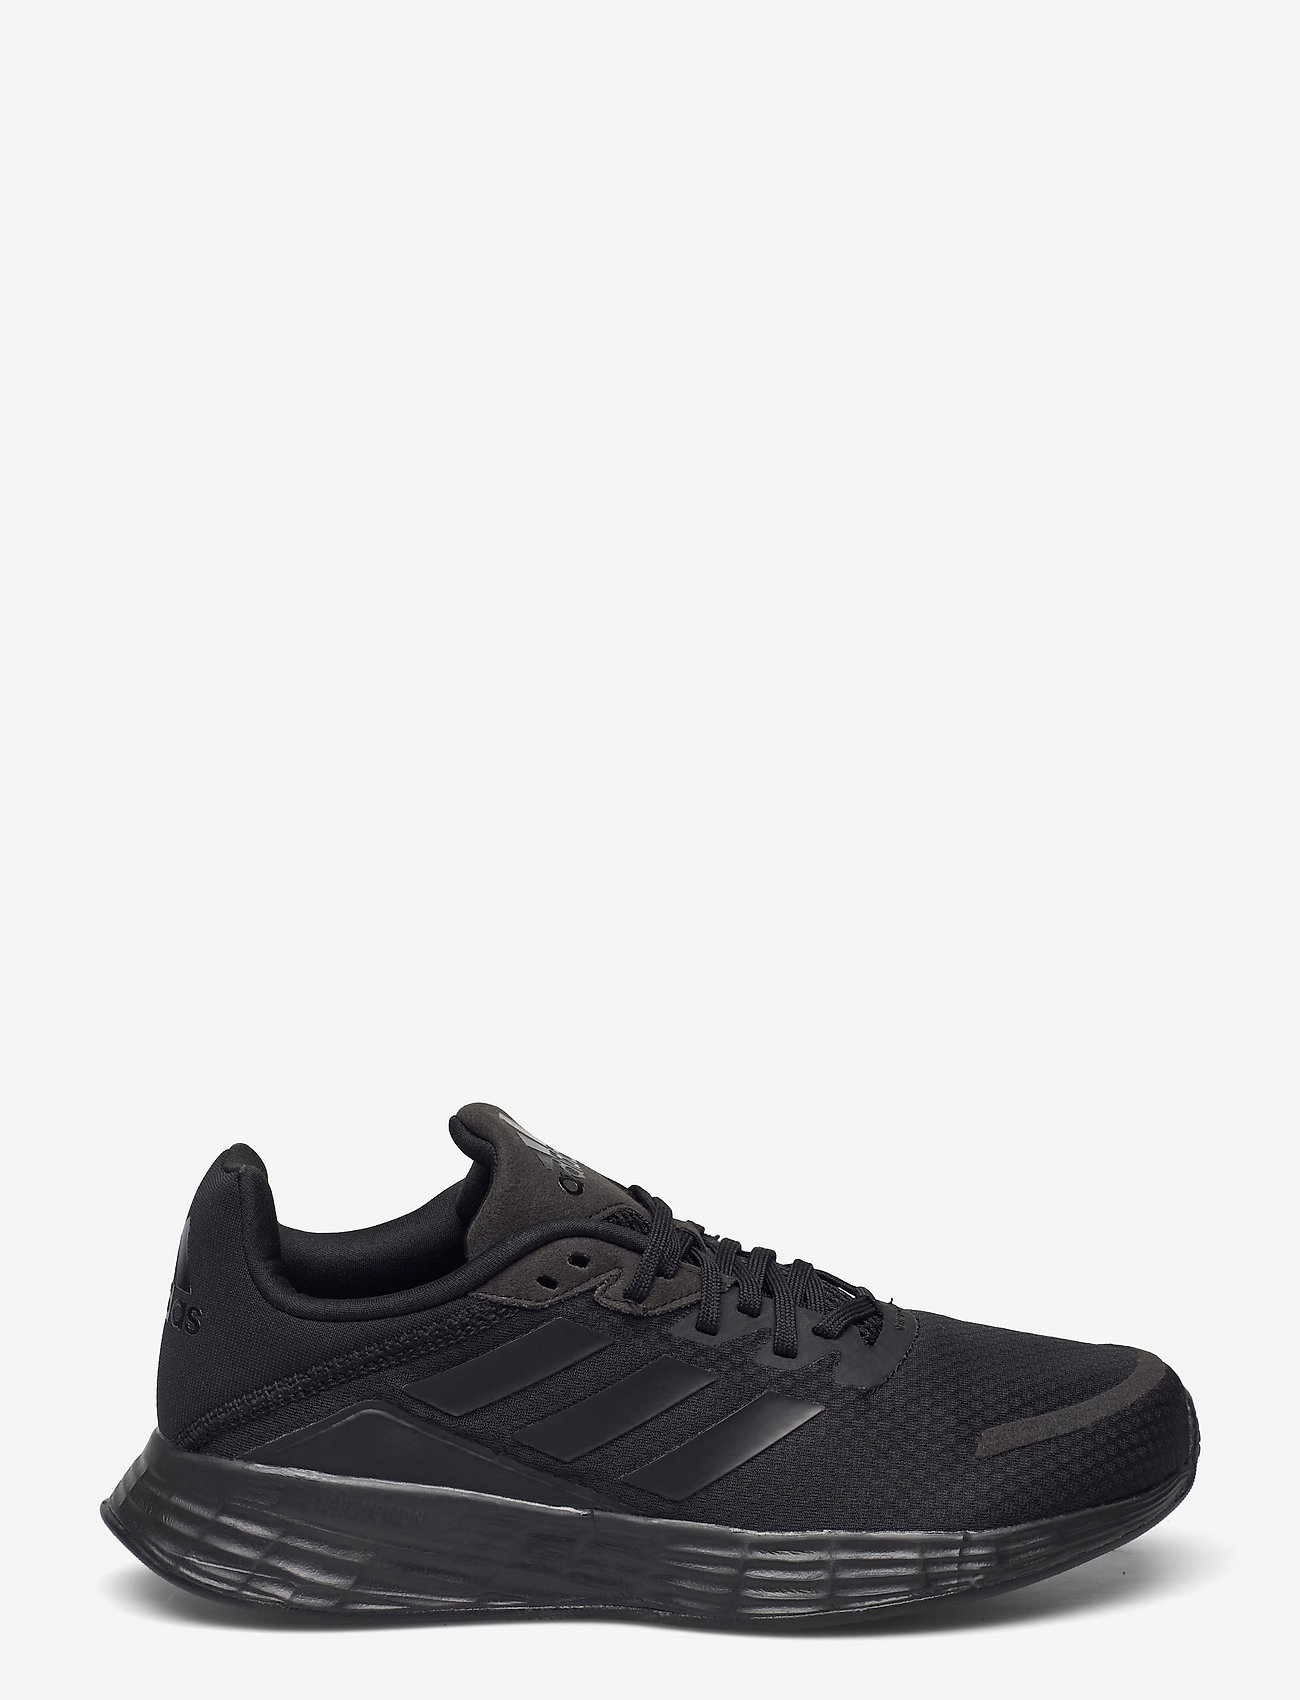 adidas Performance - Duramo SL - löbesko - cblack/cblack/ftwwht - 1